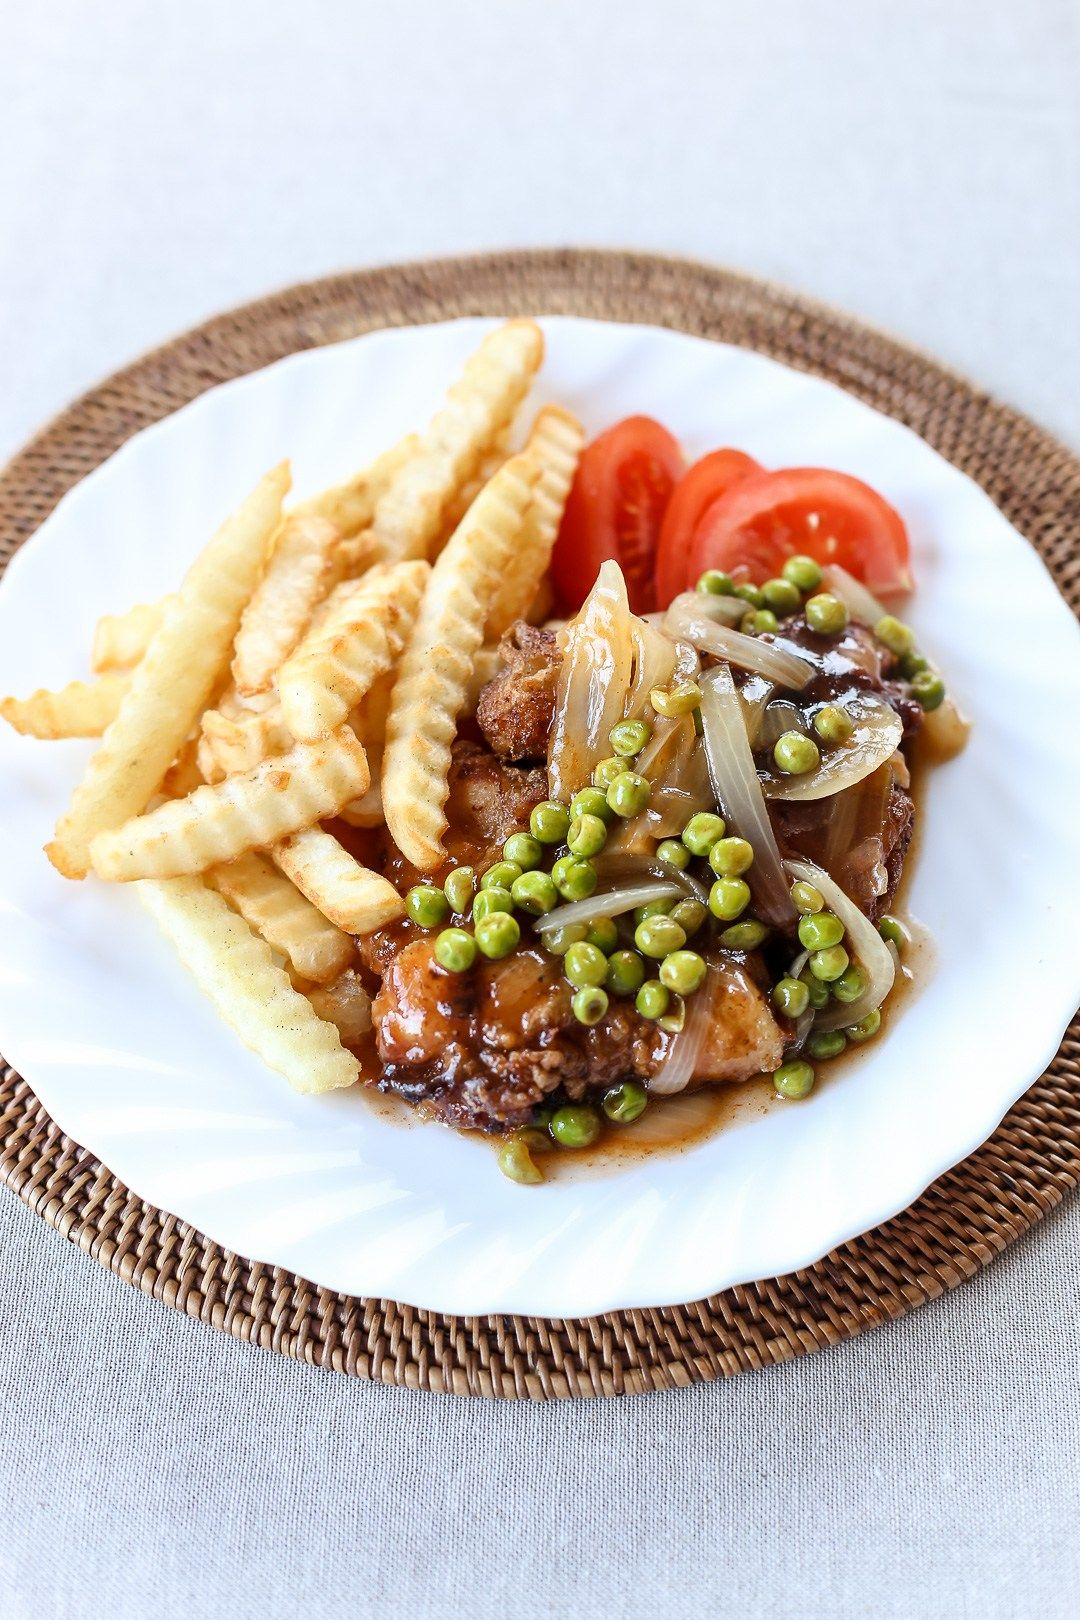 Hainan chicken chop angsarap malaysianfood asian food cuisine forumfinder Choice Image